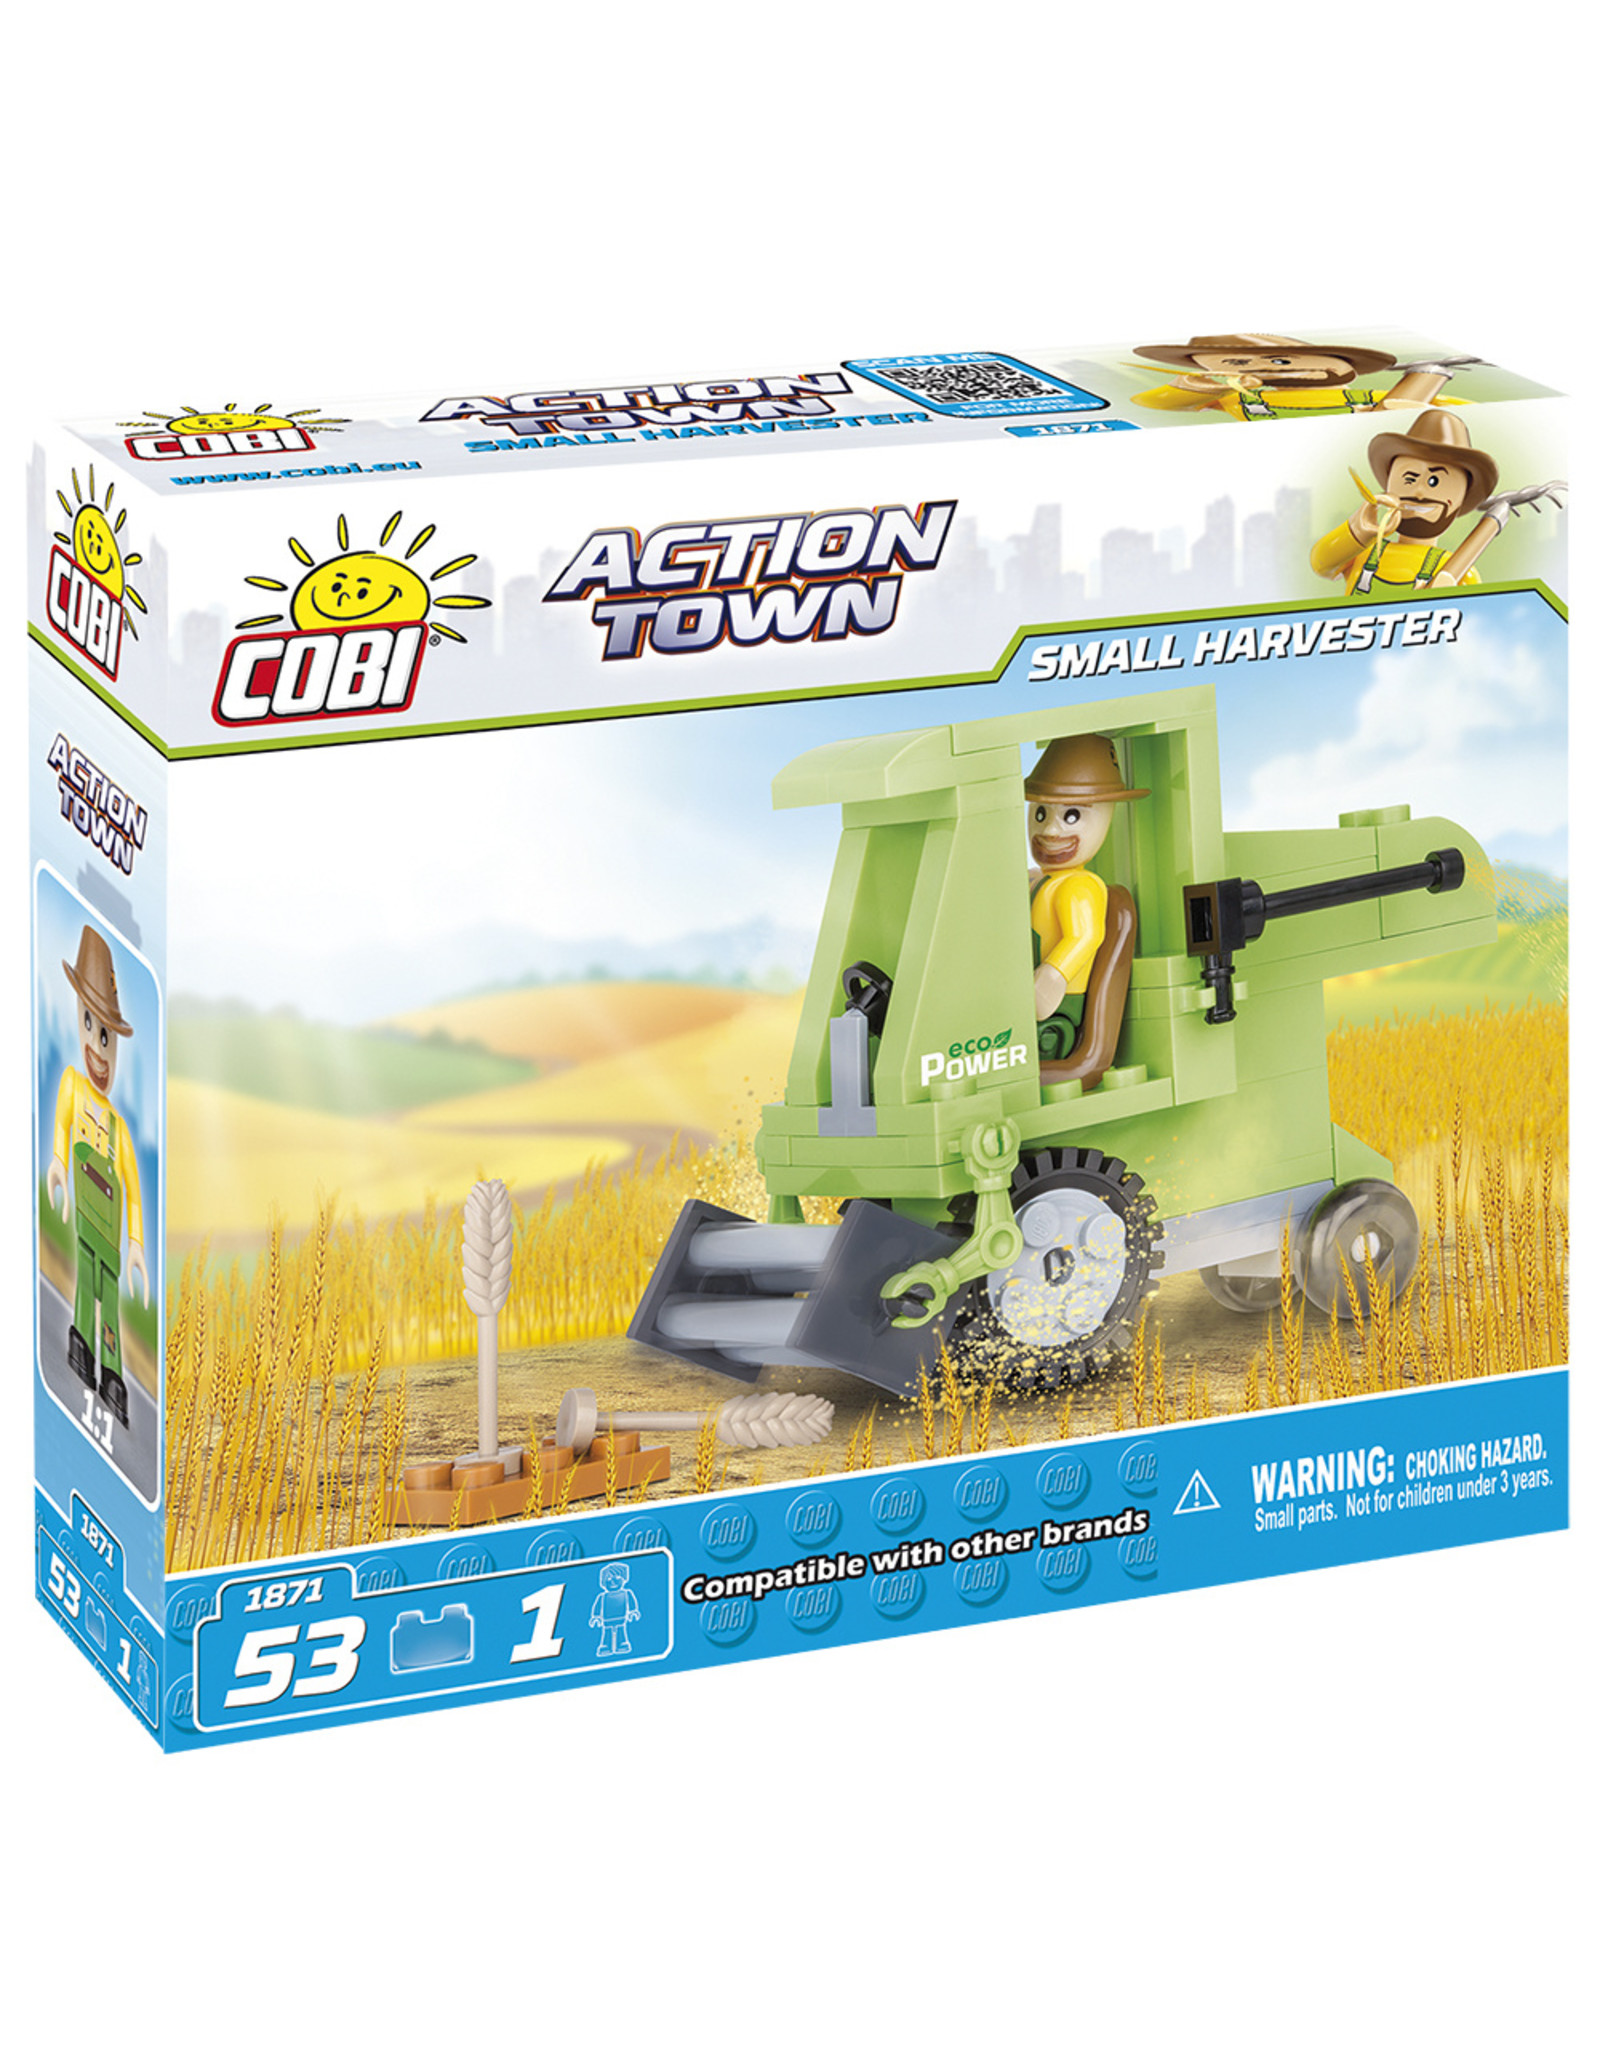 COBI COBI Action Town 1871 - Small harvester